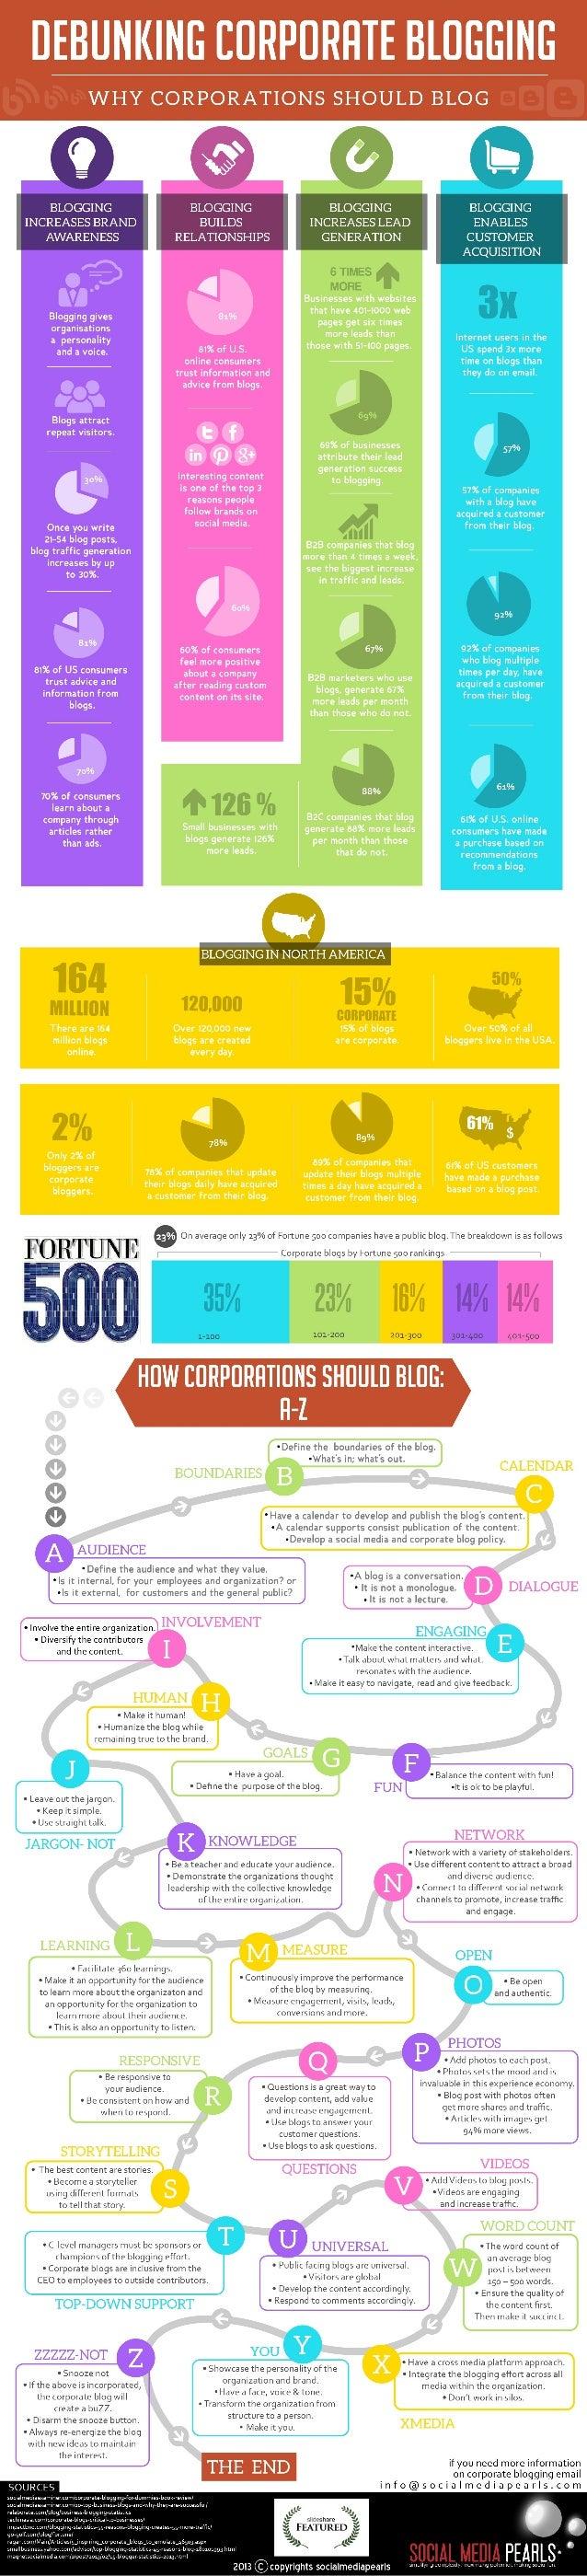 Debunking Corporate Blogging